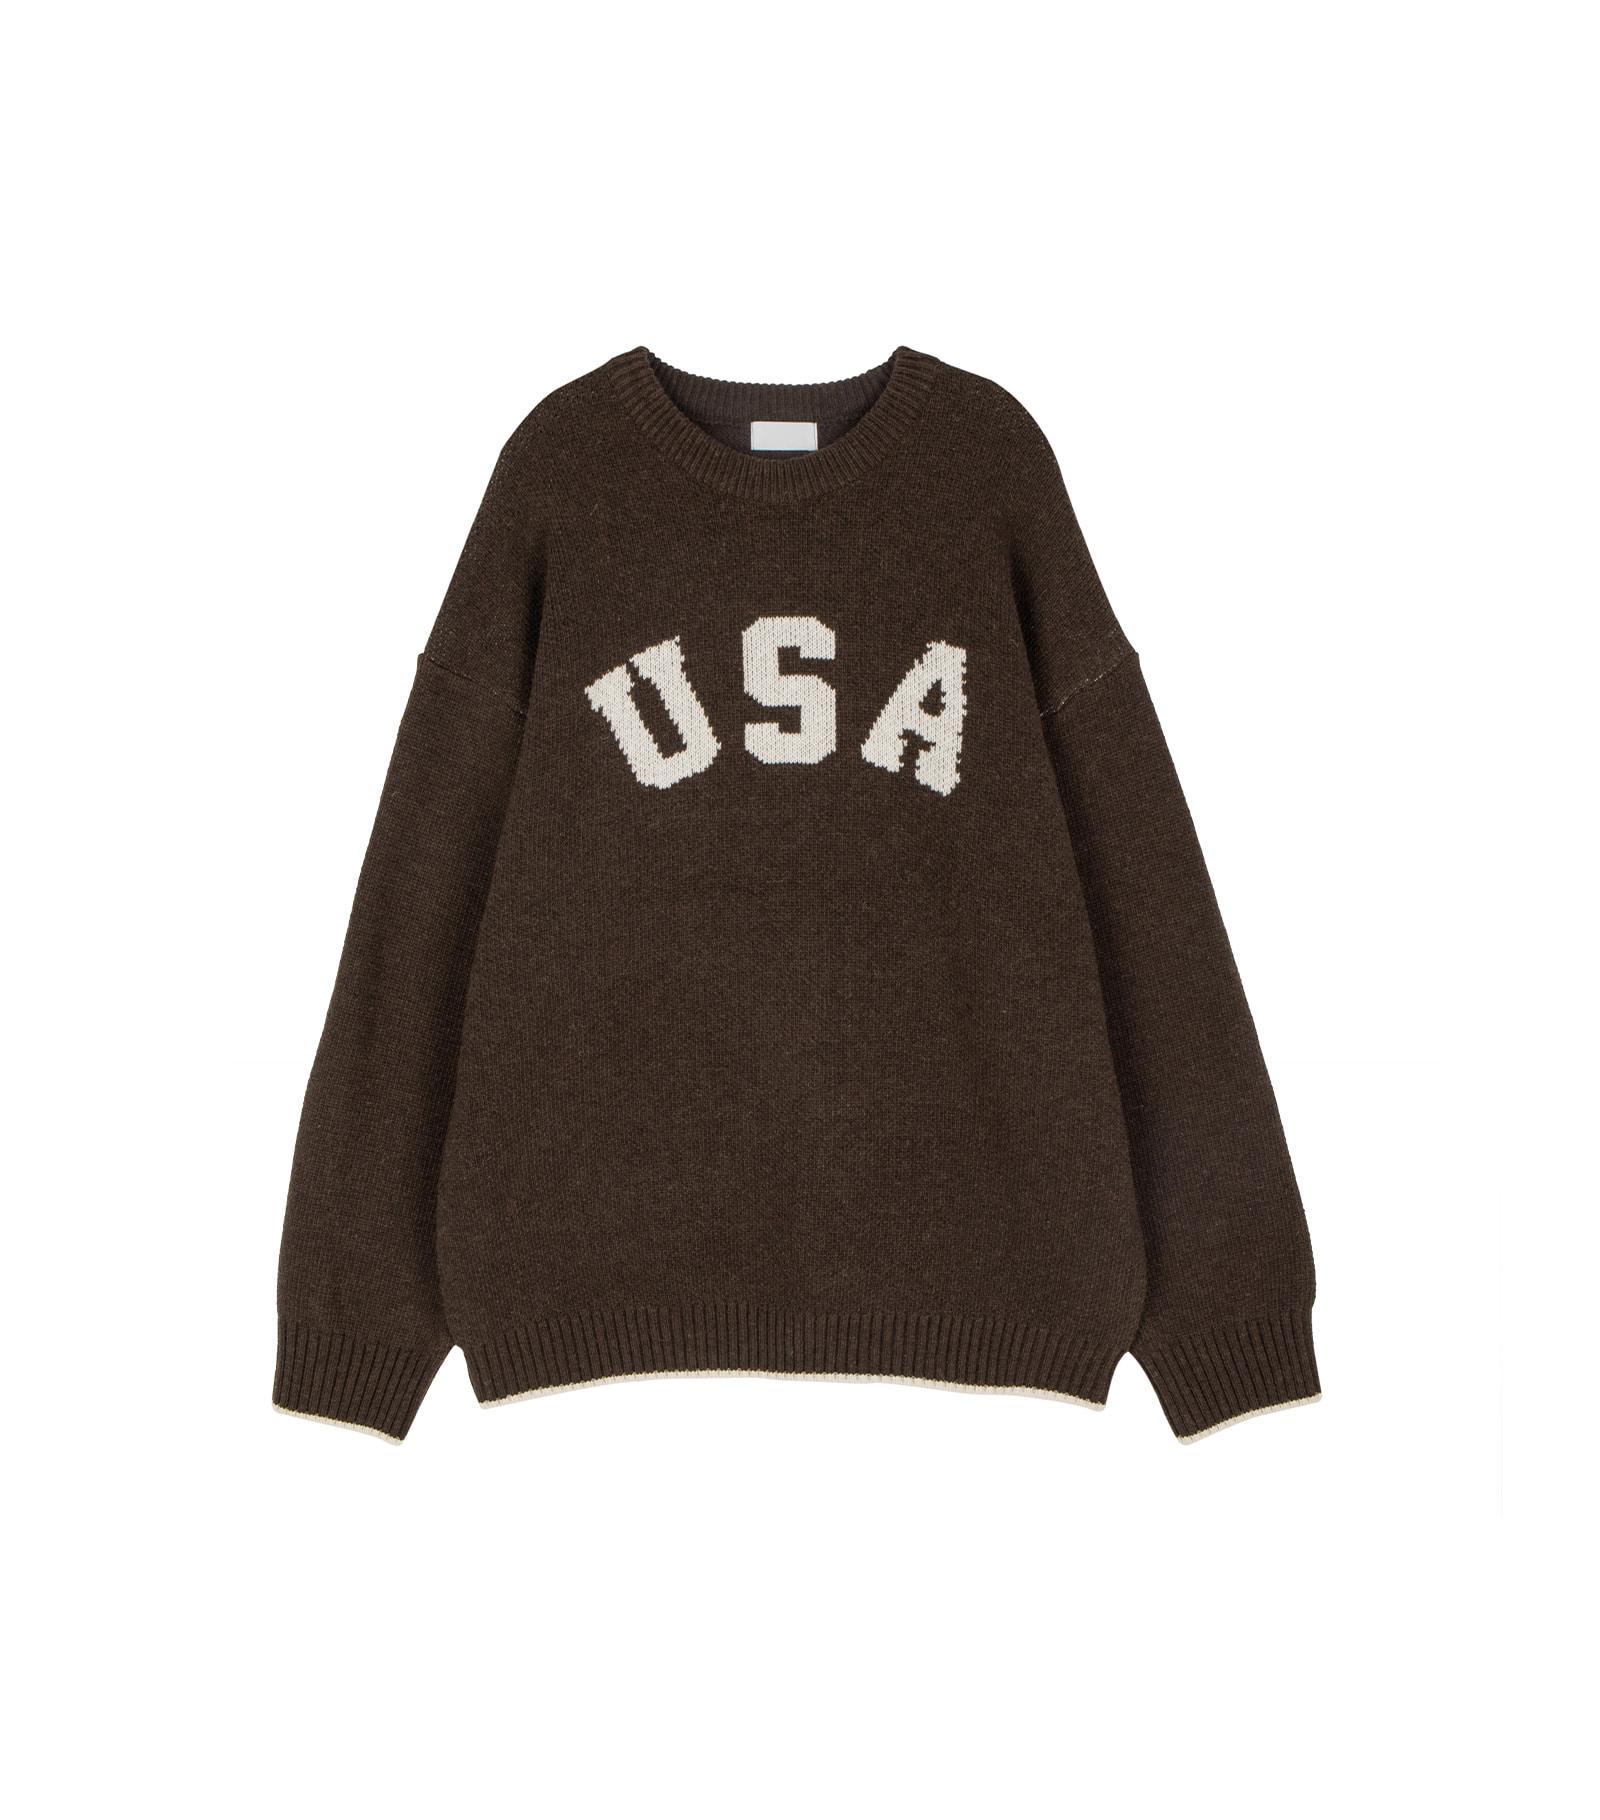 Unisex America Rams Wool Knit